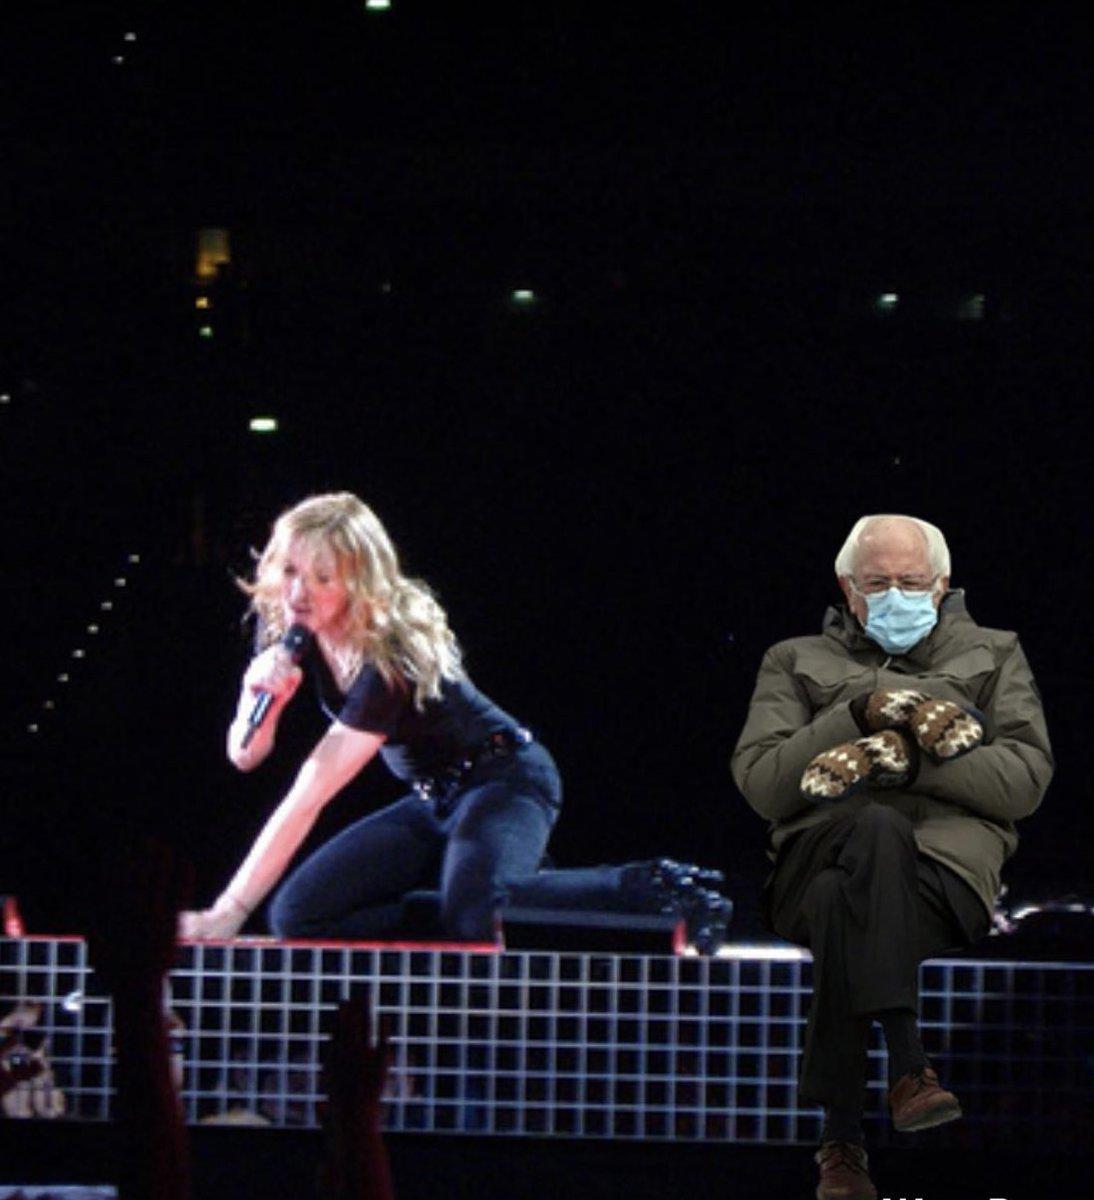 """Just watch me BERN!"" 😬 #Madonna #BernieSanders #berniesMittens #berniememes"